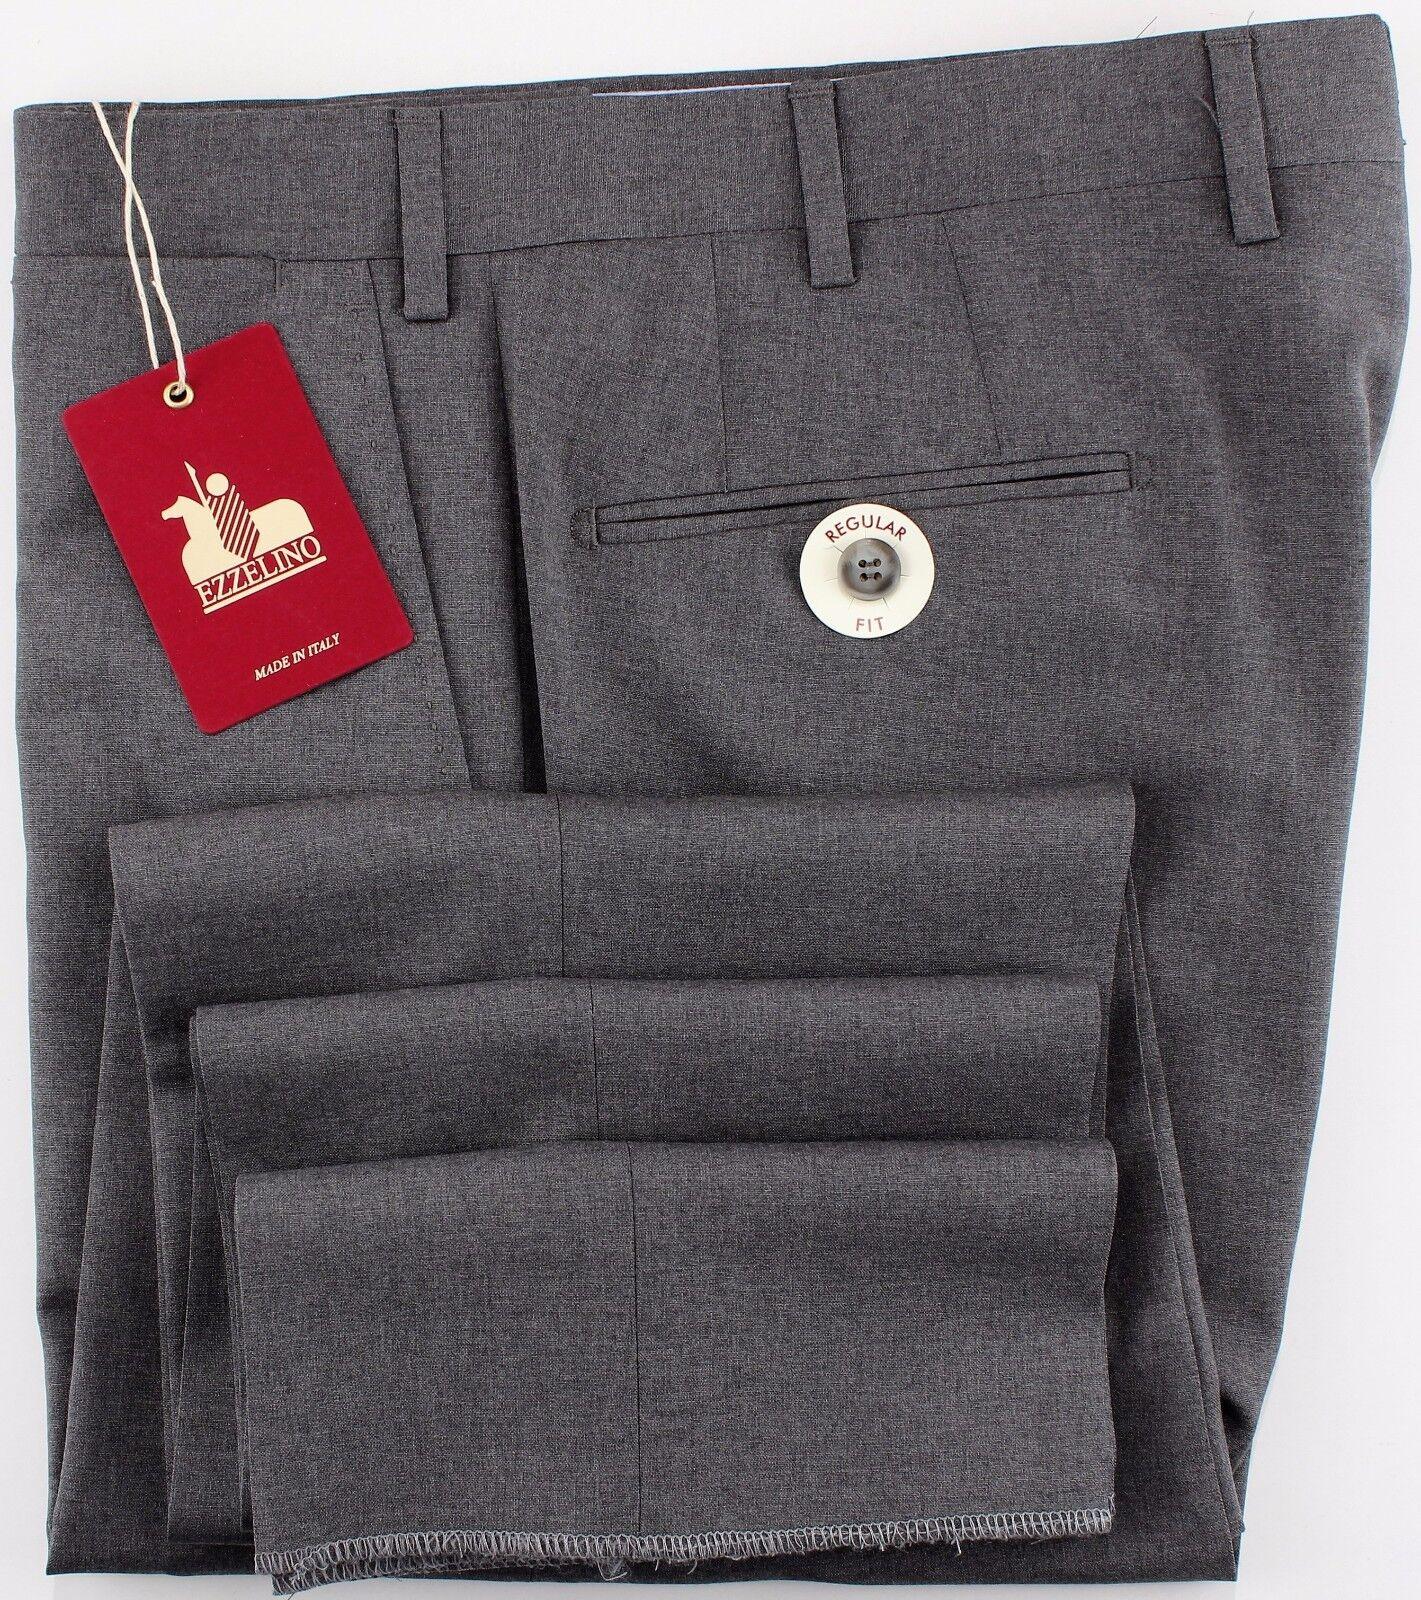 NWT 299  EZZELINO DRESS PANTS Cerruti wool Summer grey handmade  eu54 us 38